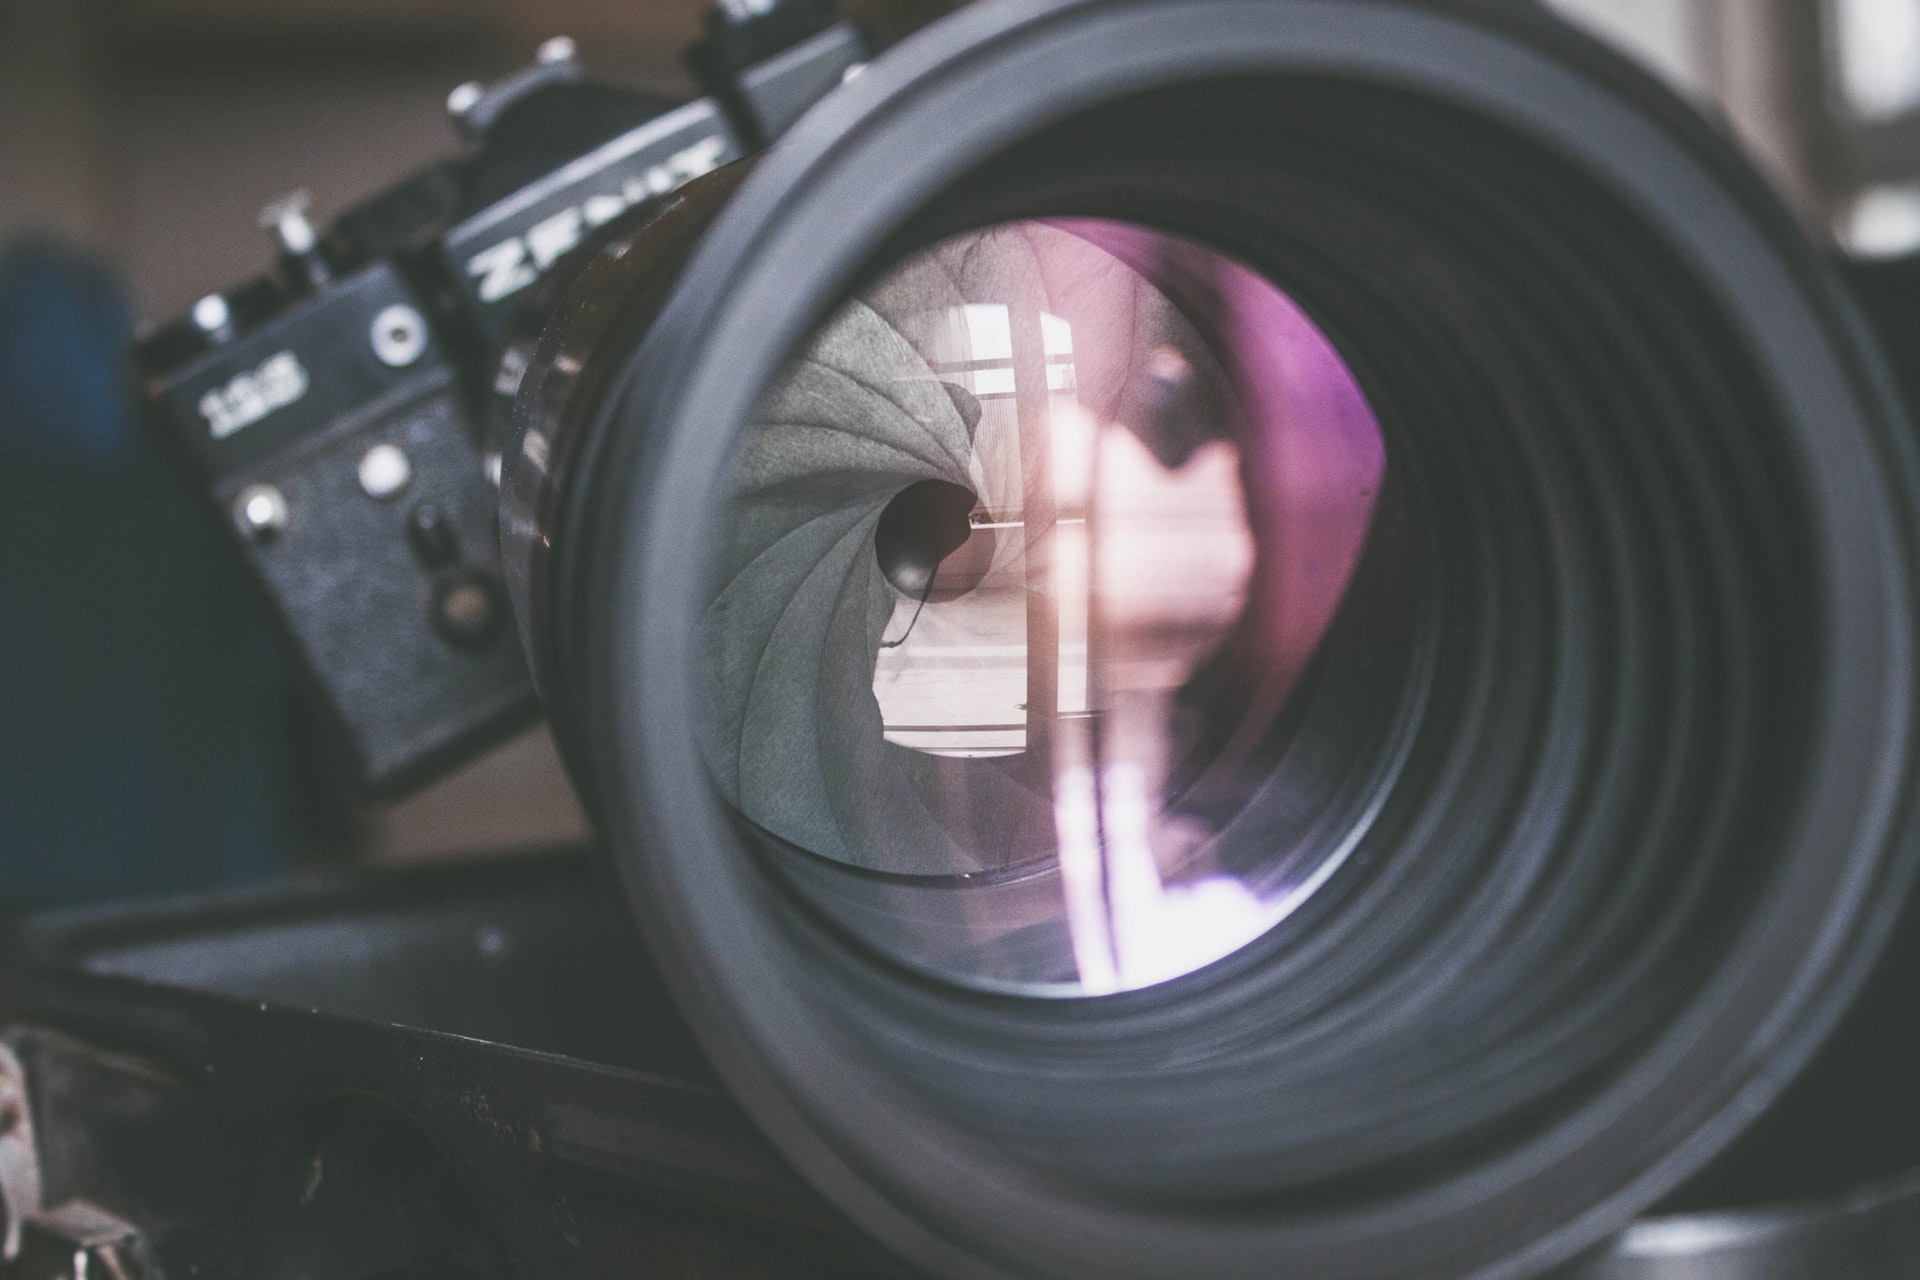 Photographers' Tour